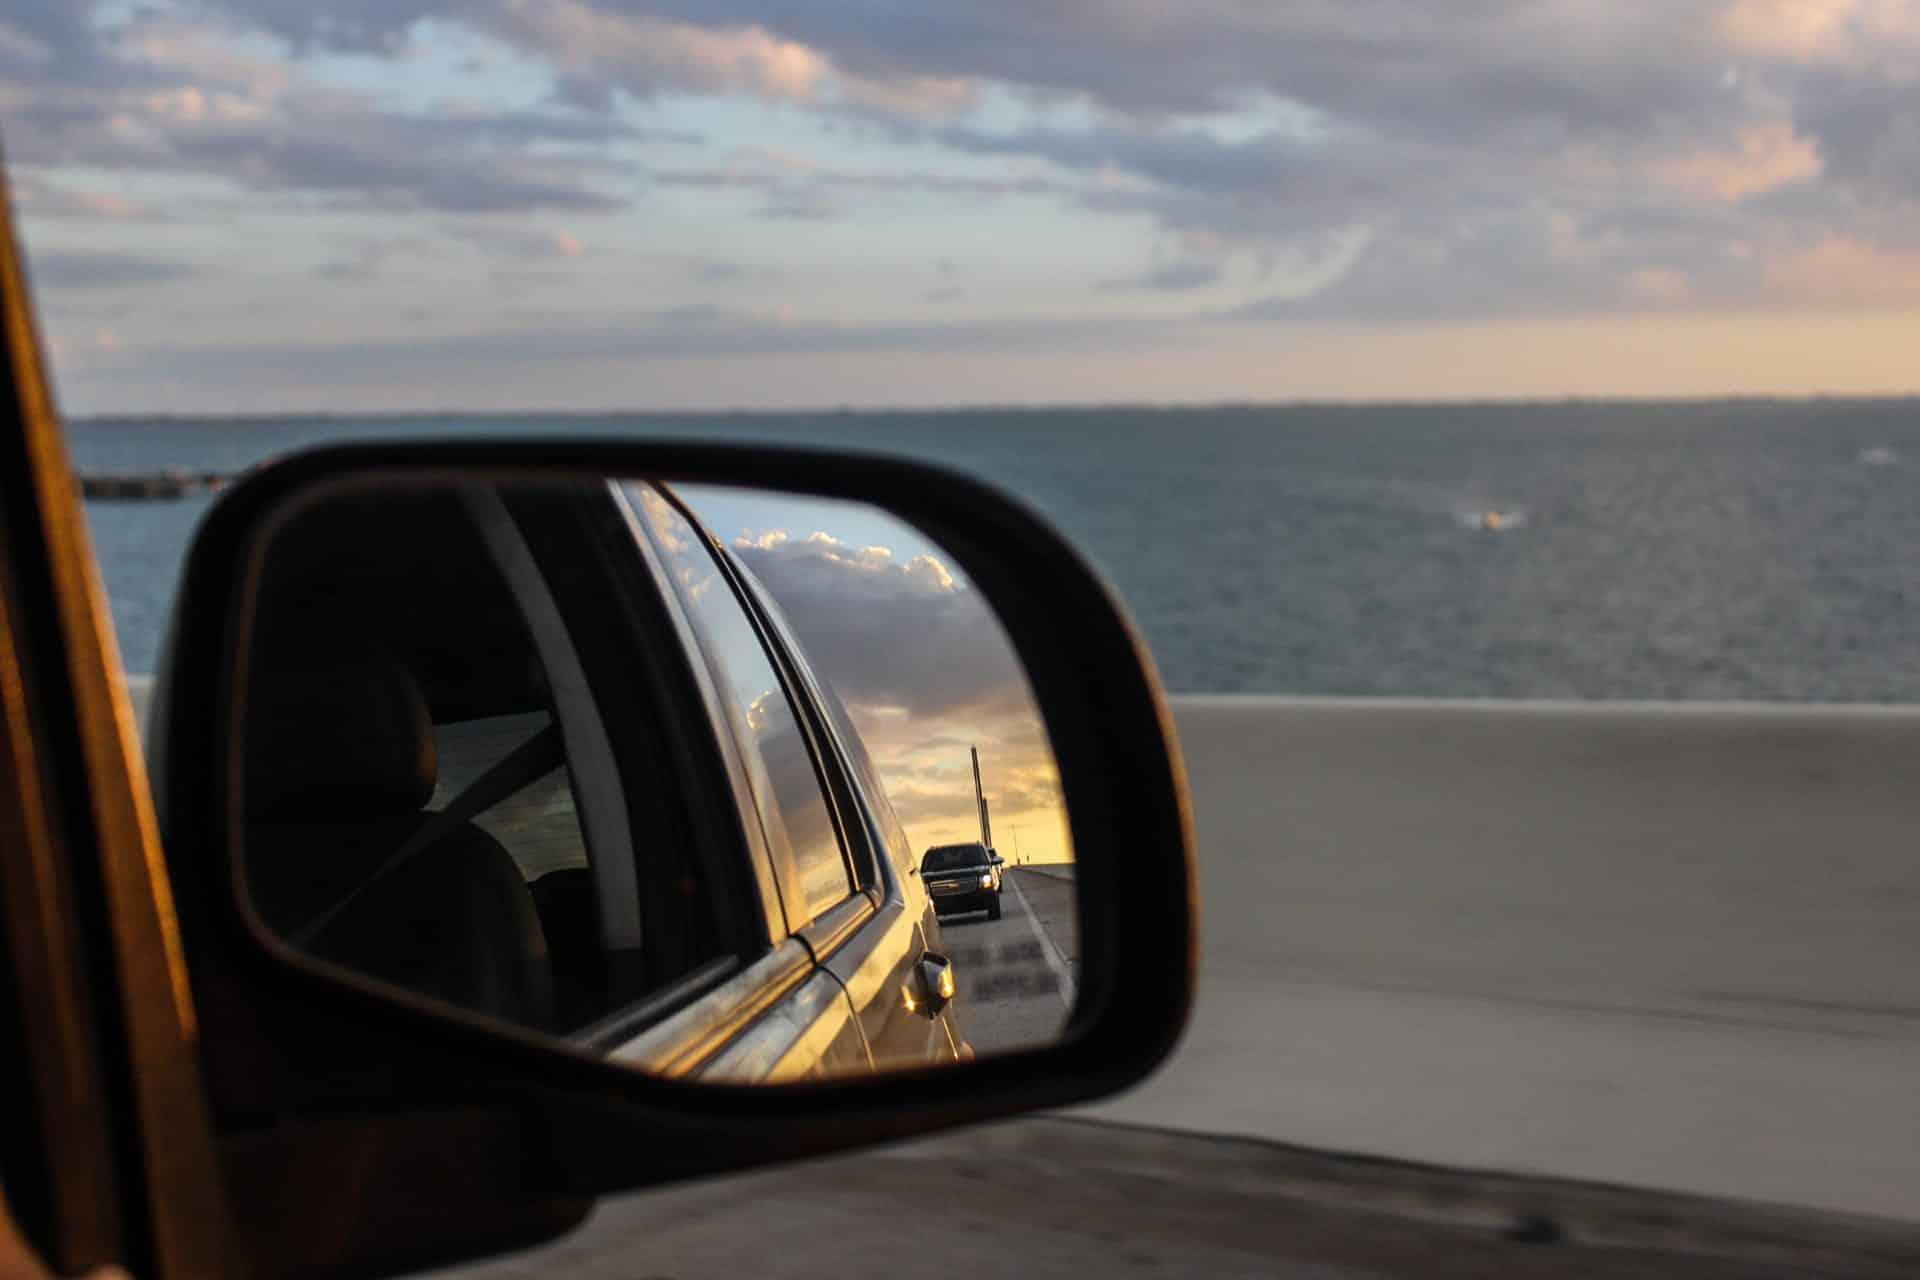 Fim de tarde na Sunshine Skyway Bridge, em St. Petersburg, Flórida